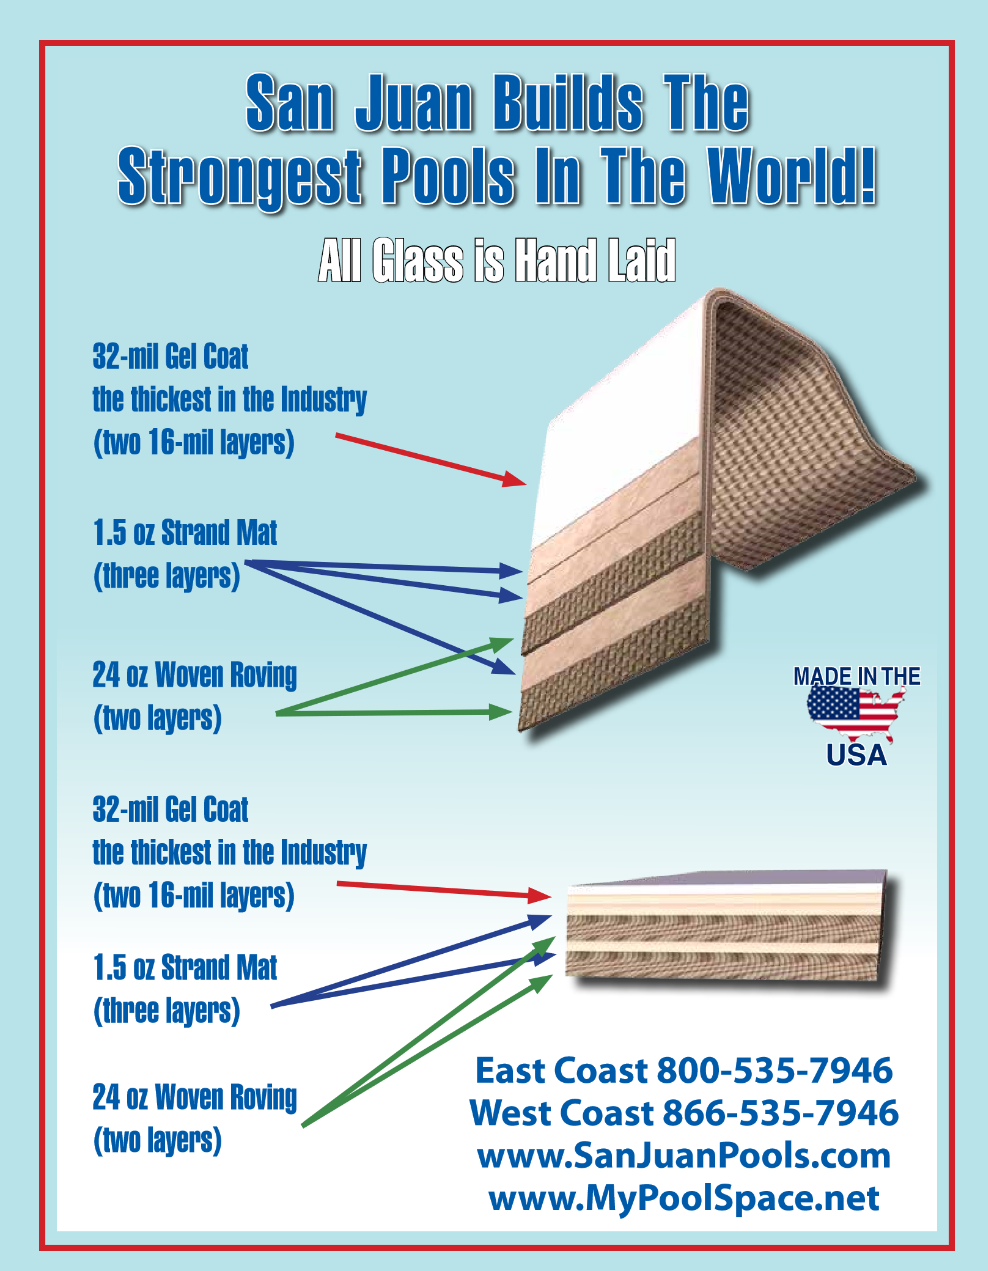 San Juan Pools - Layers of a Fiberglass Pool (Spec Sheet)